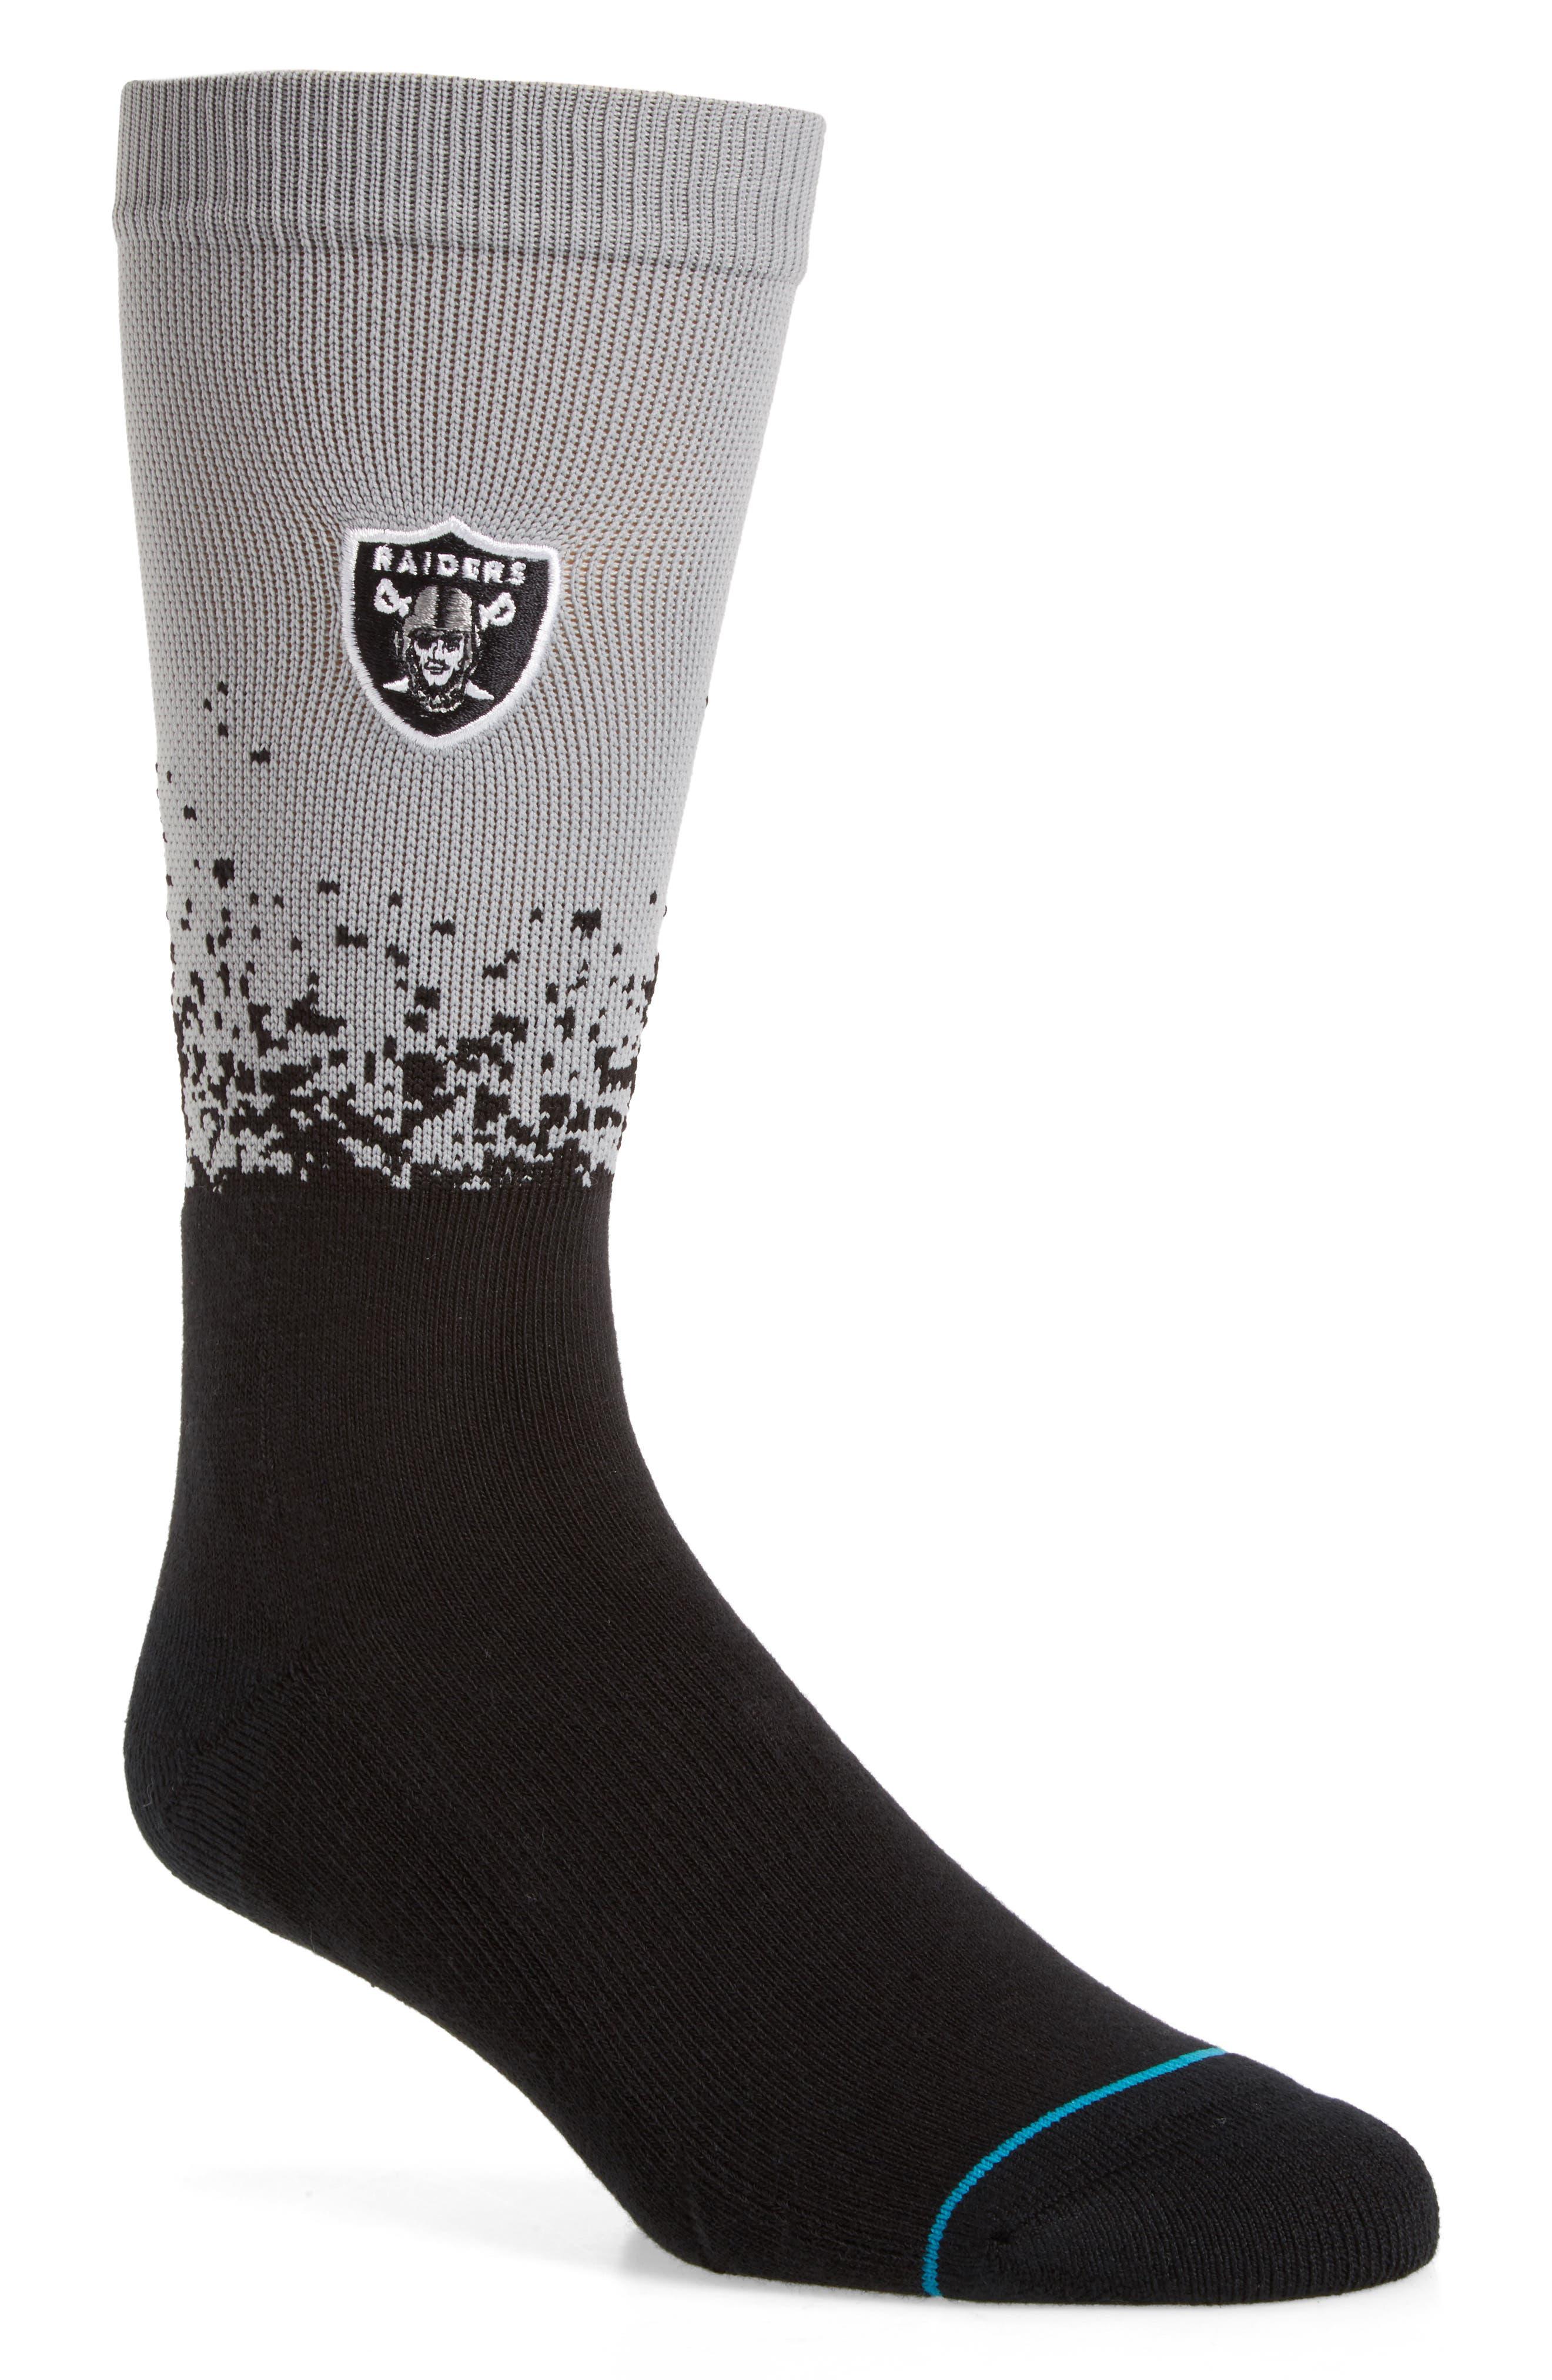 Stance Oakland Raiders - Fade Socks